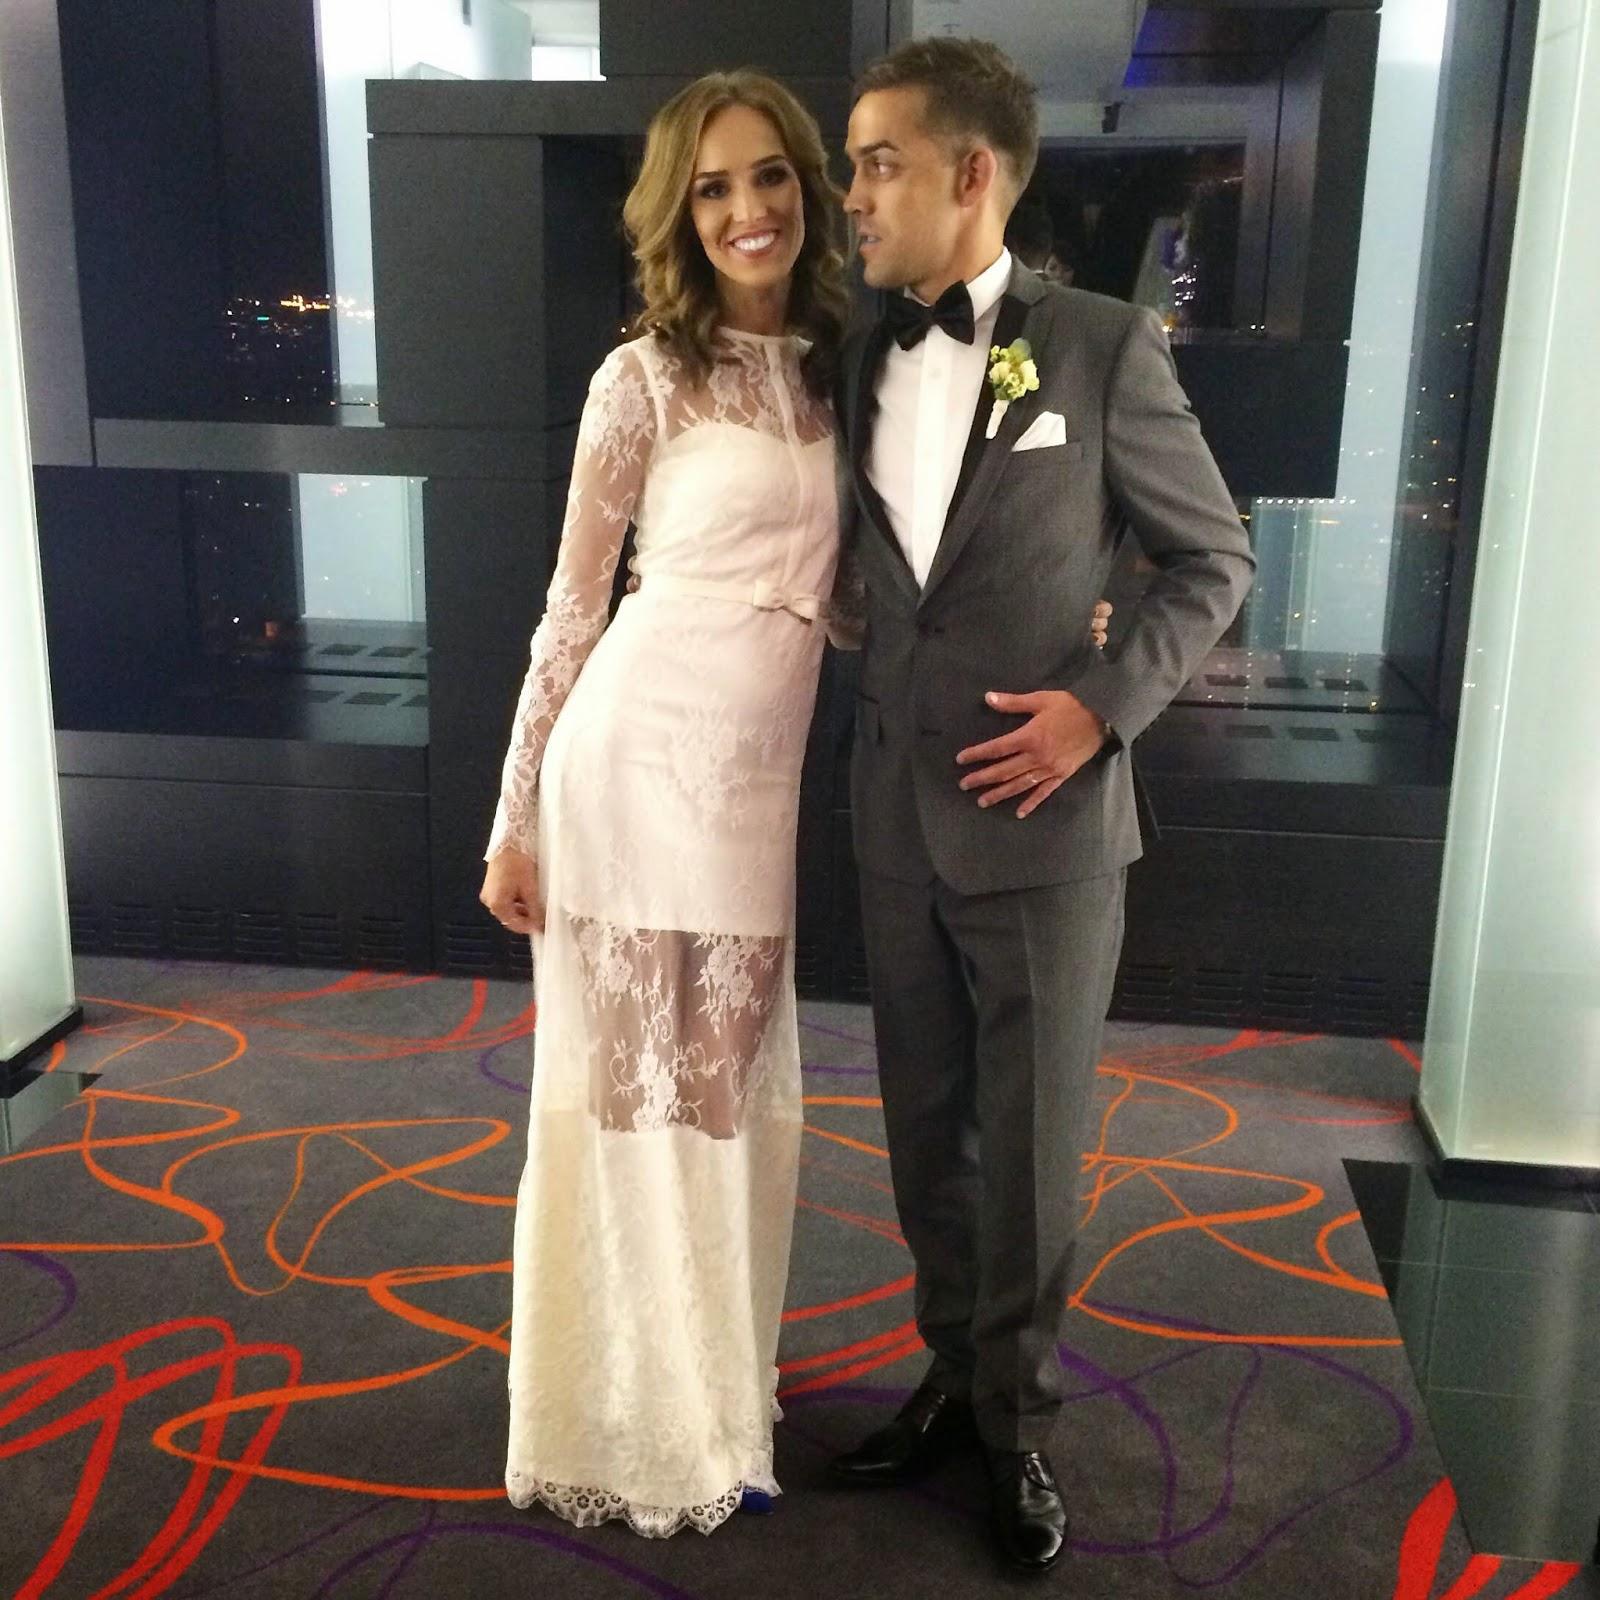 wedding-bride-groom-white-lace-dress-gray-suit-black-bowtie